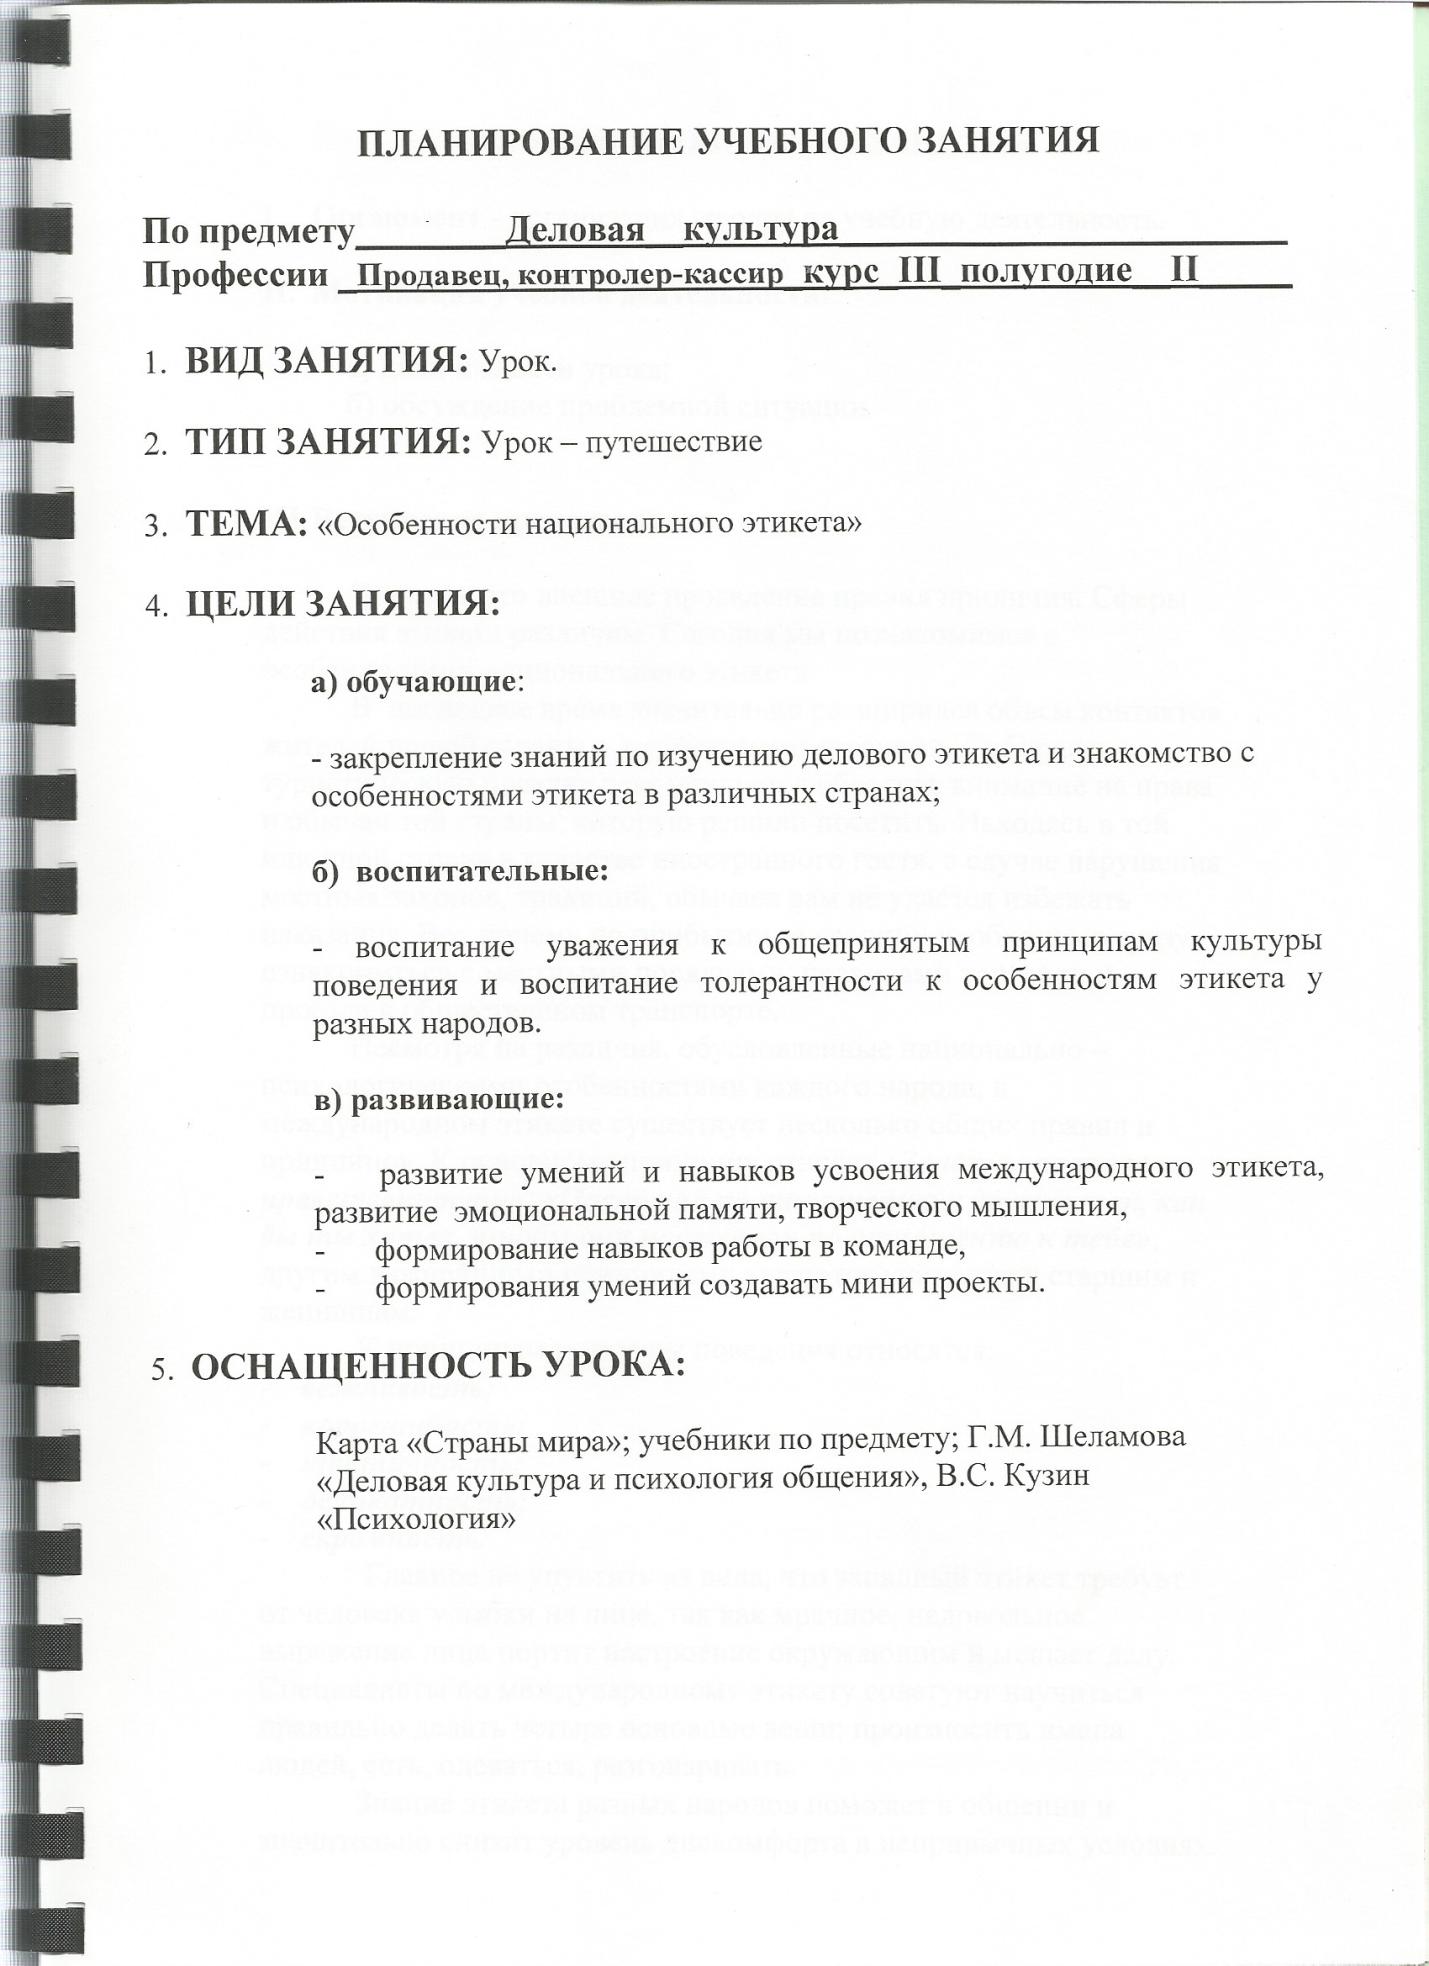 C:\Documents and Settings\Николай\Мои документы\Мои рисунки\Урок путешествие2.bmp